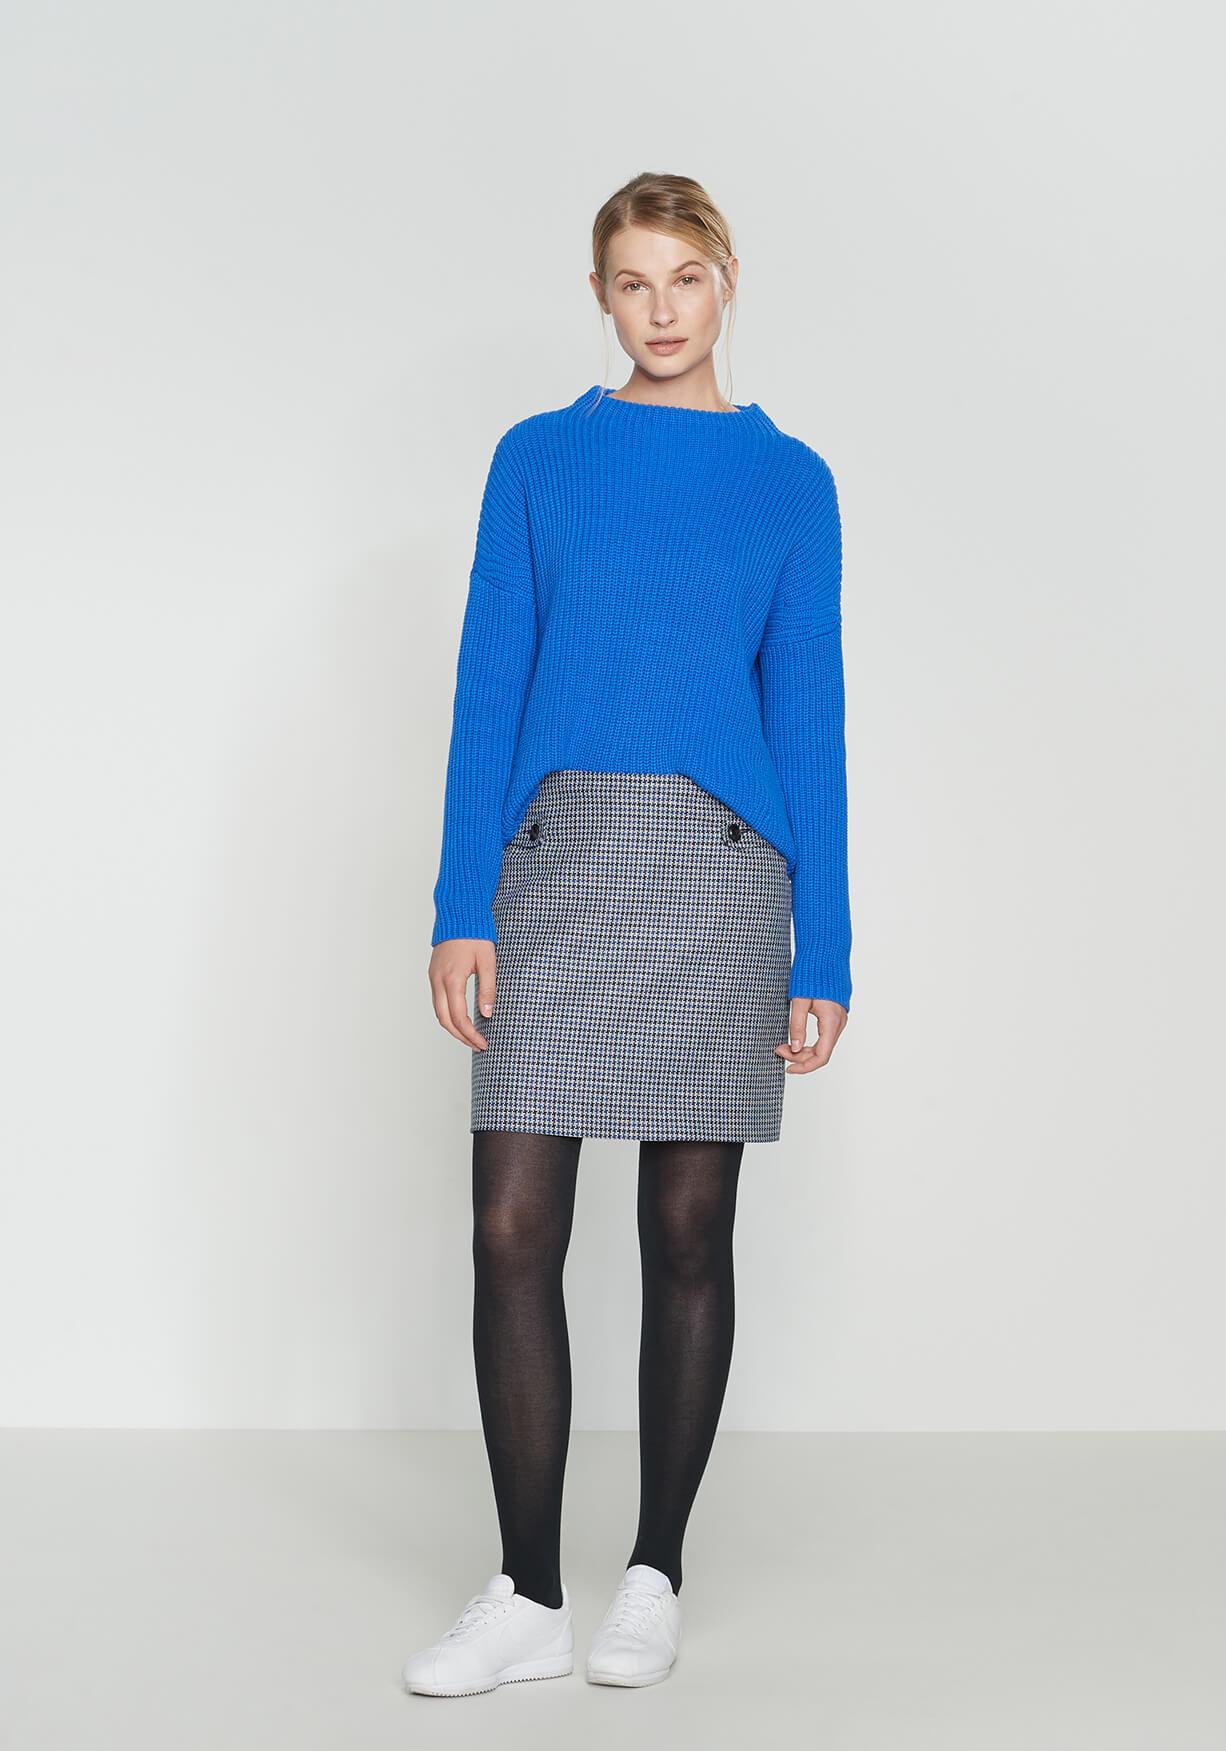 Blau Grau Style